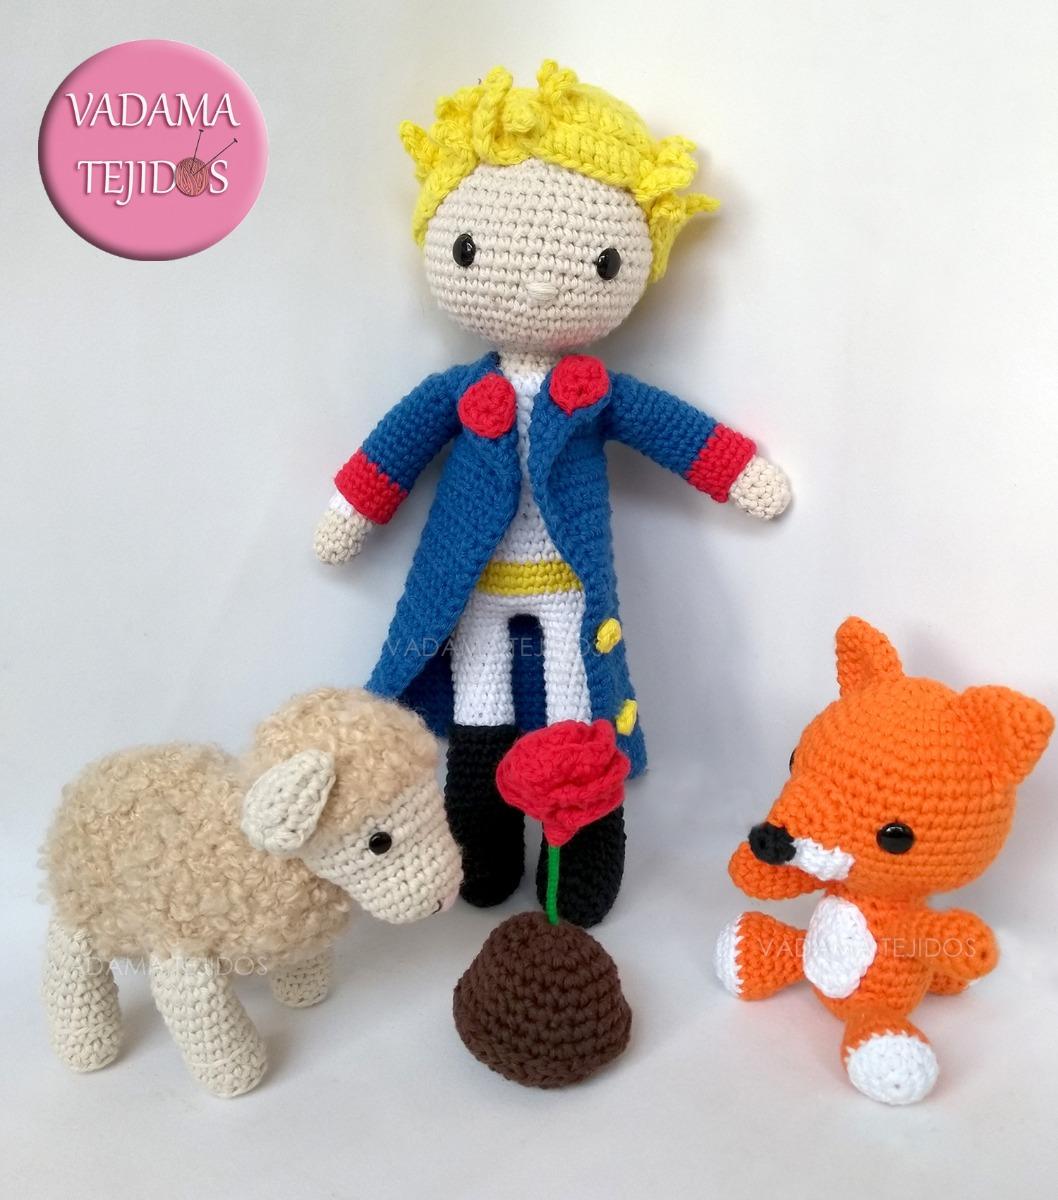 Volpe Portachiavi Amigurumi Tutorial 🦊 Fox Keychain Crochet ... | 1200x1058